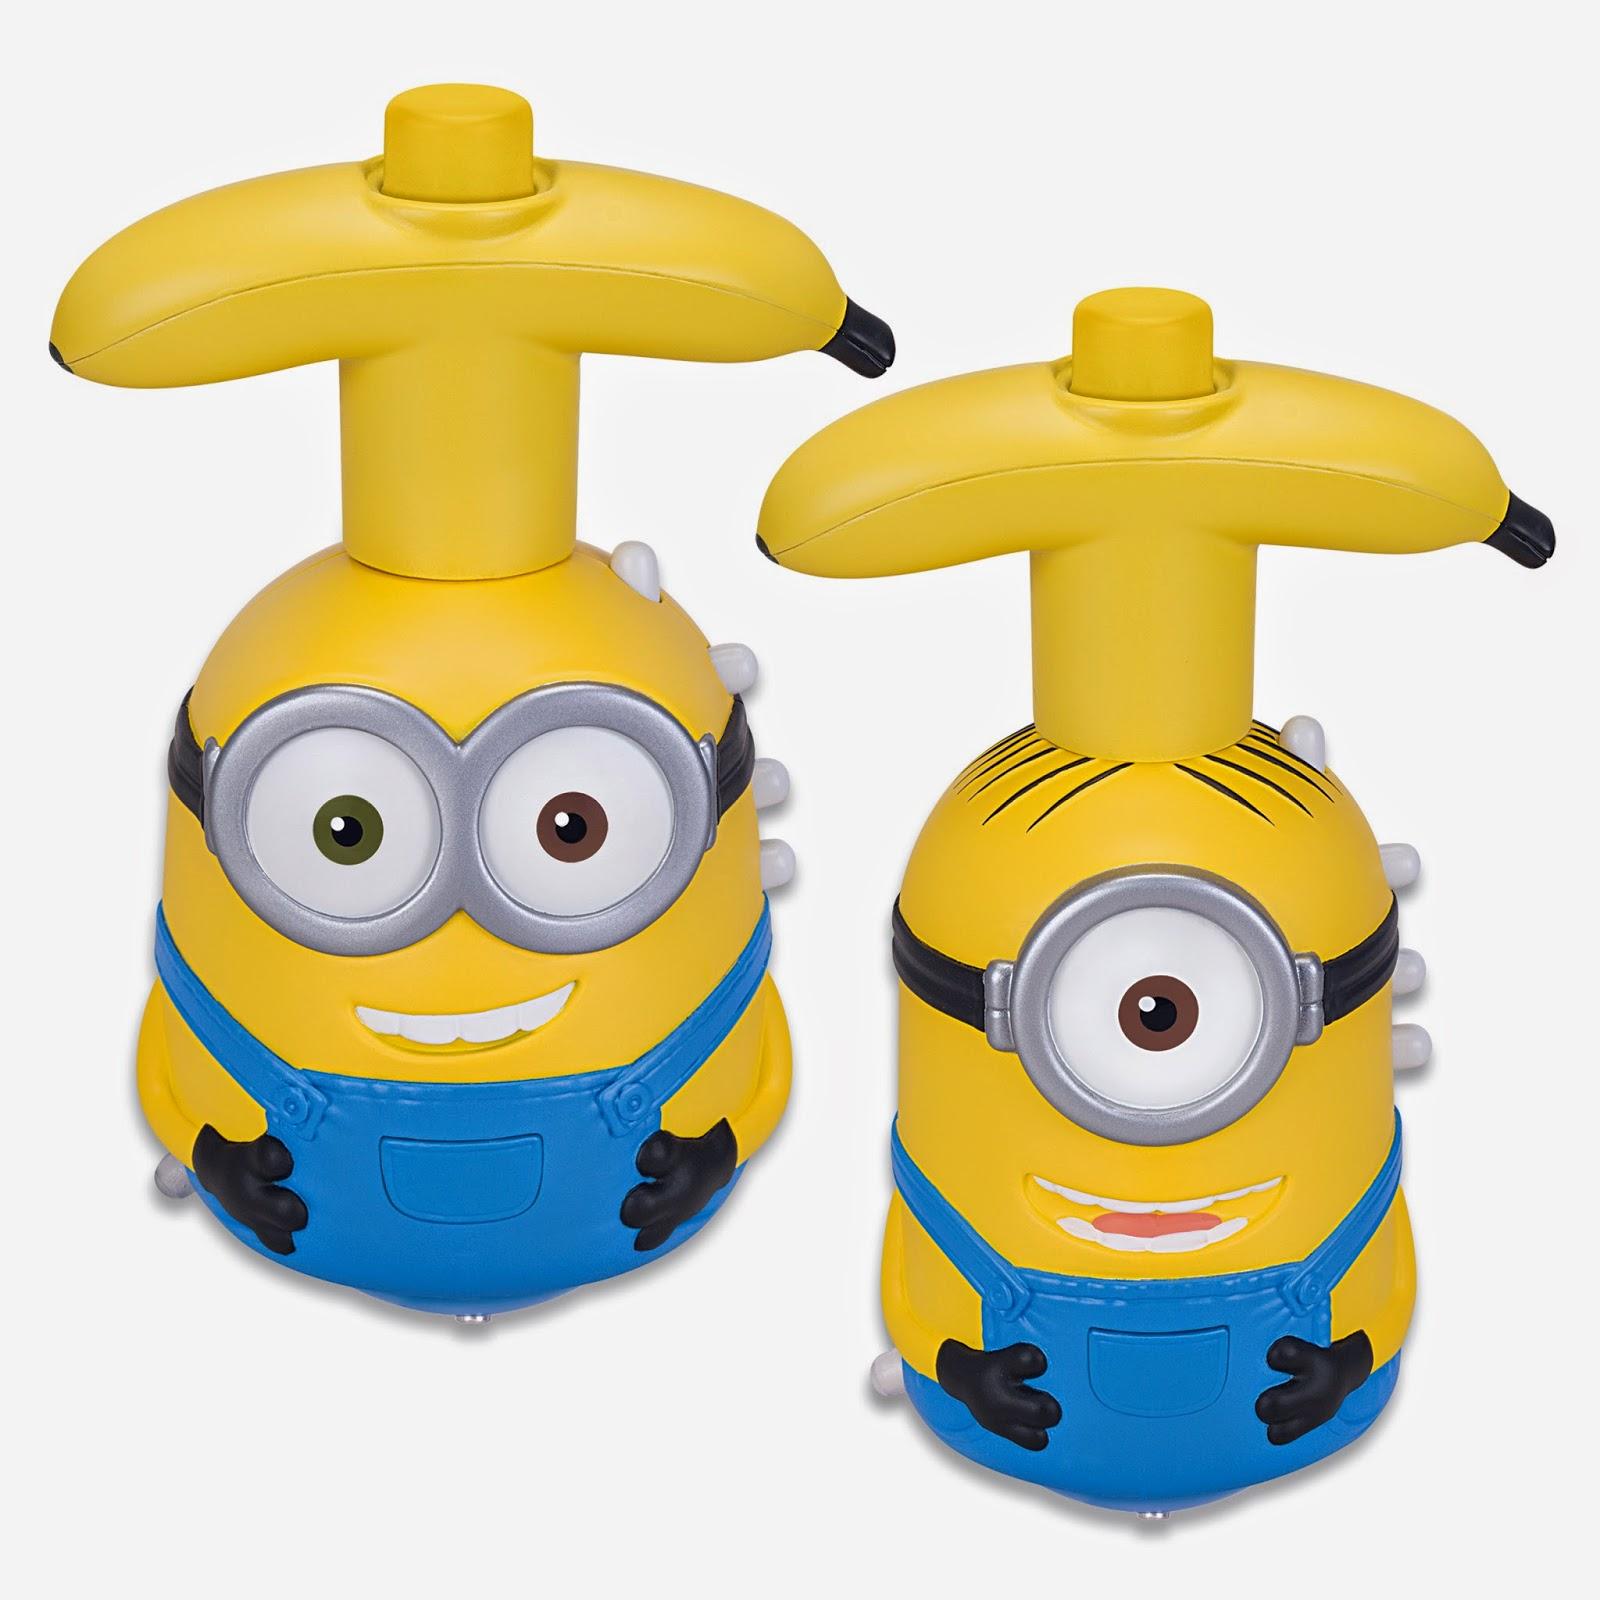 Minion Toys And Games : The mommy s guide minions moooooovie toy fair